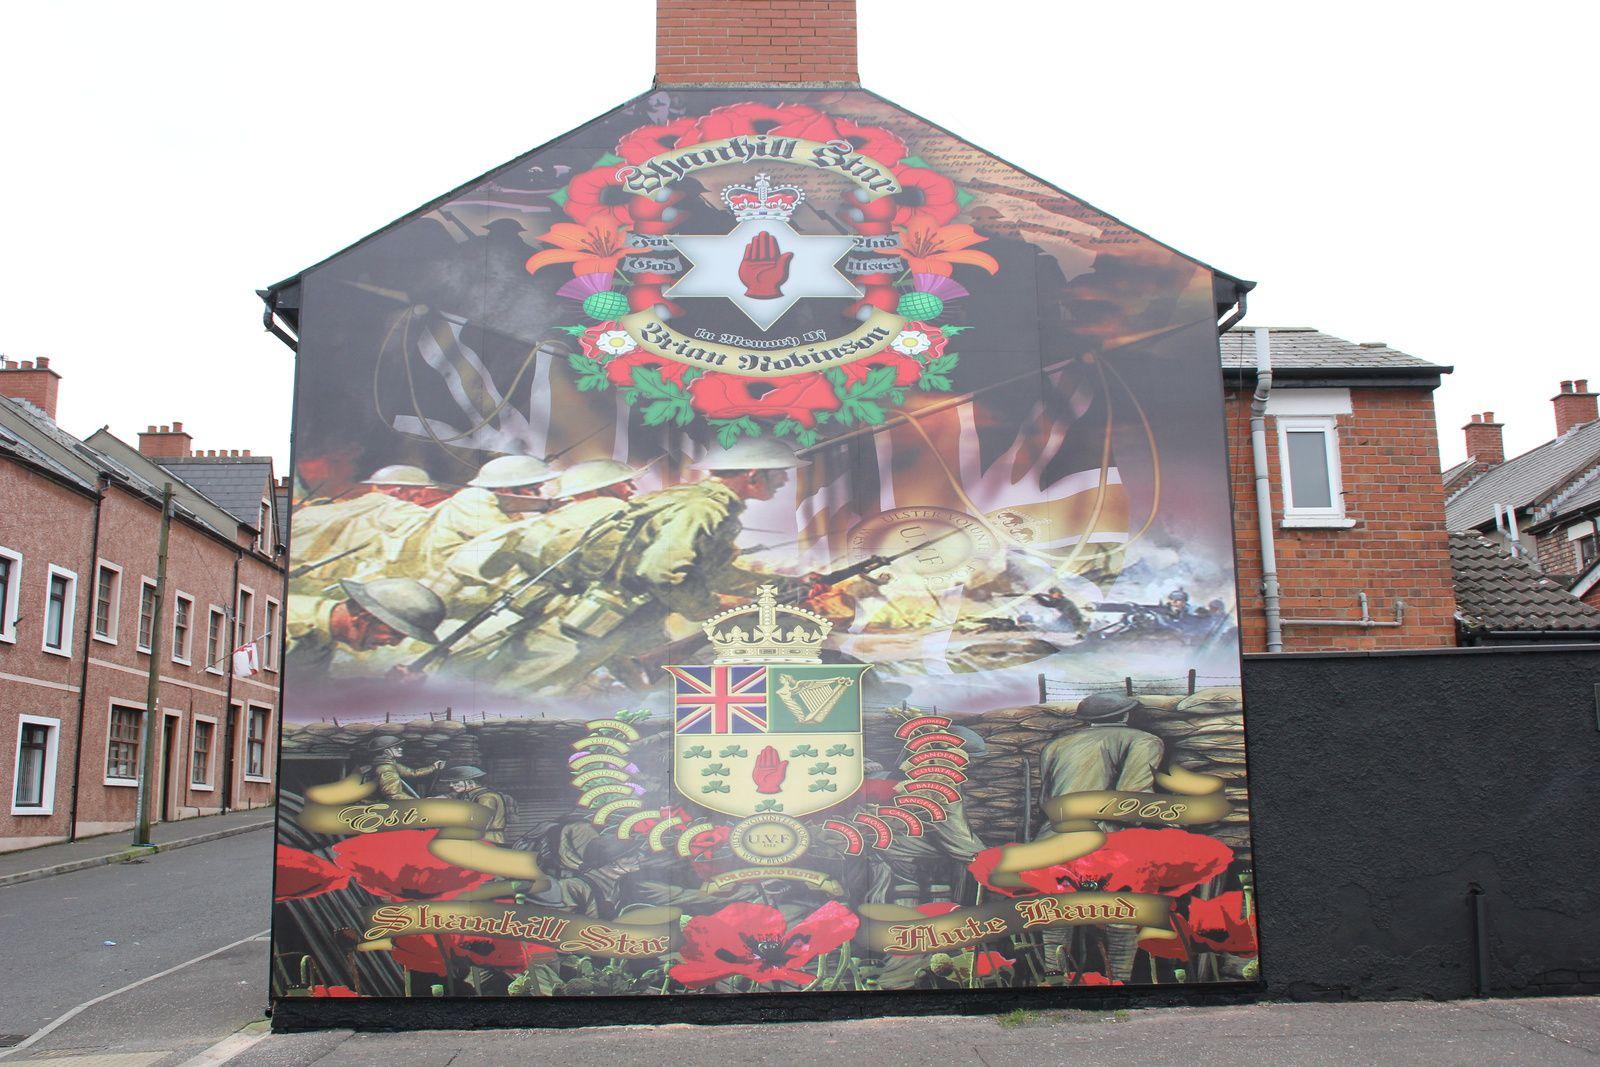 517) Disraeli Street, West Belfast